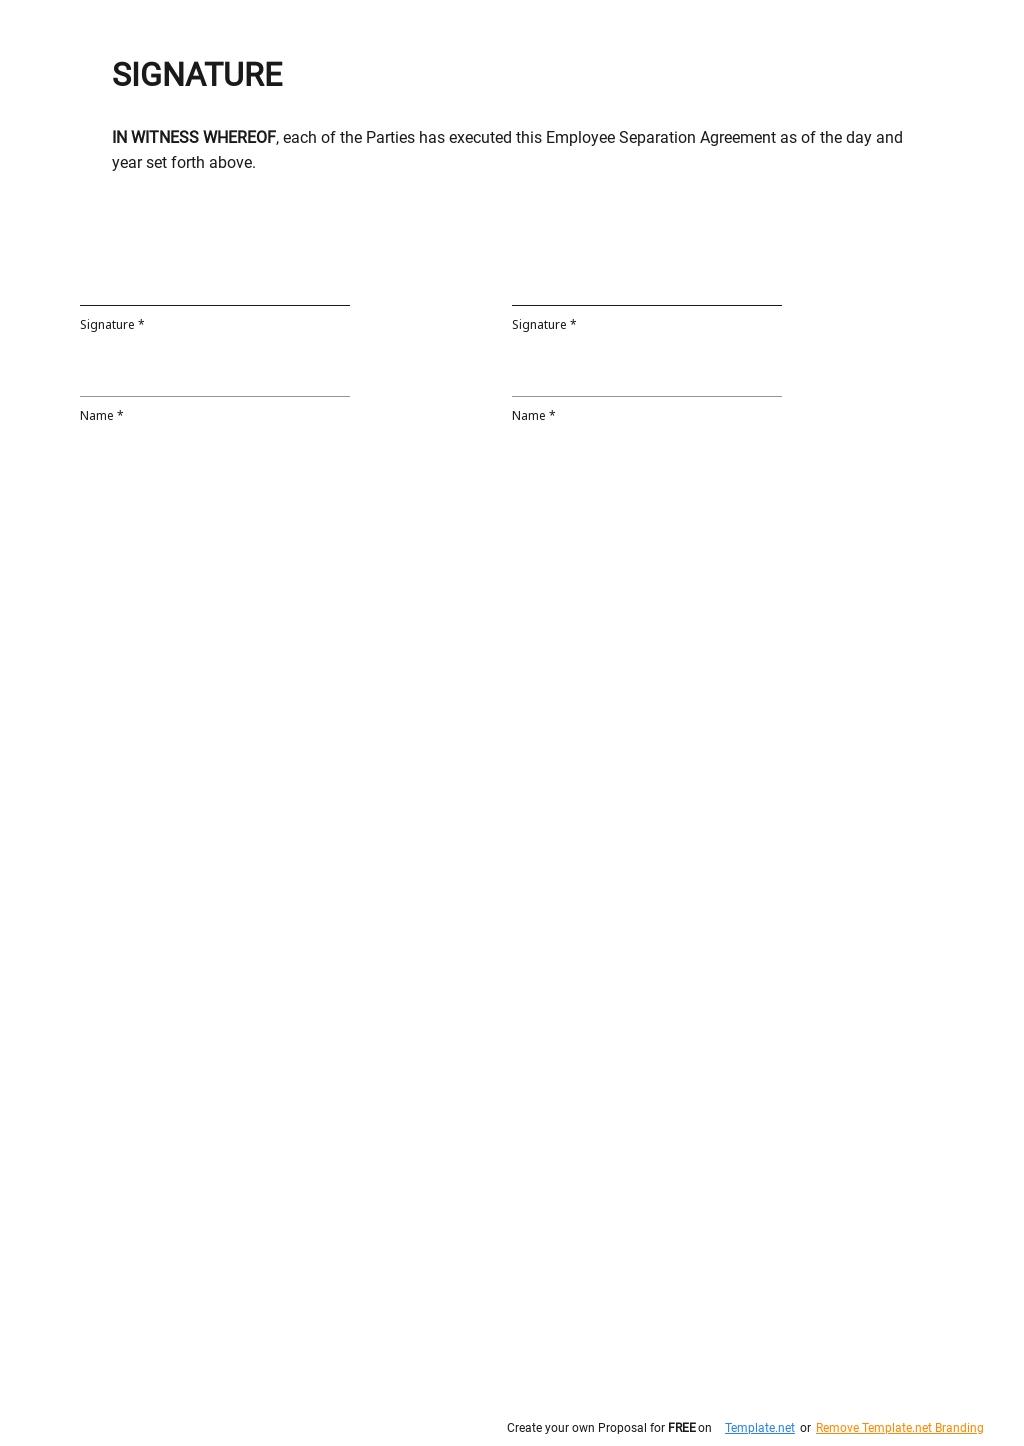 Sample Employee Separation Agreement Template 2.jpe